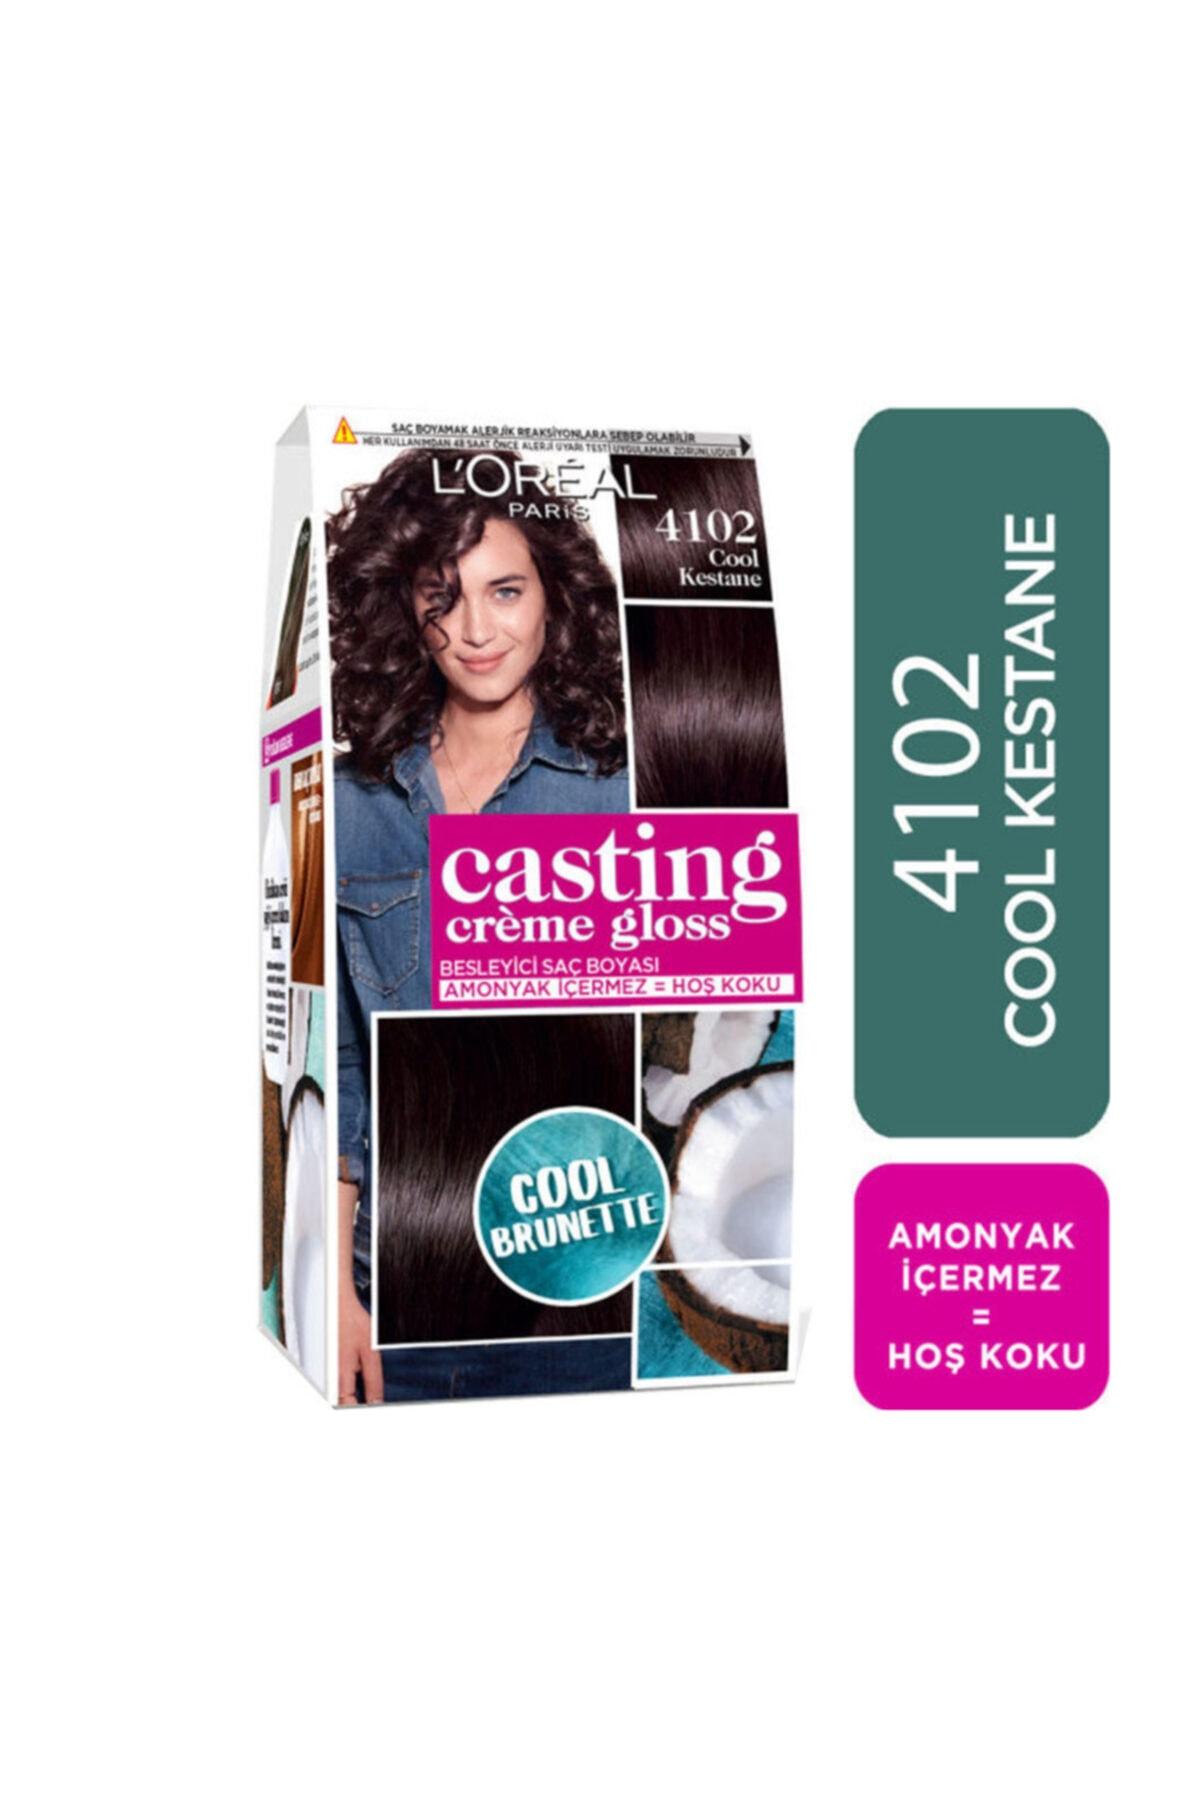 L'Oreal Paris Saç Boyası - Casting Crème Gloss 4102 Cool Kestane 3600523807154 1